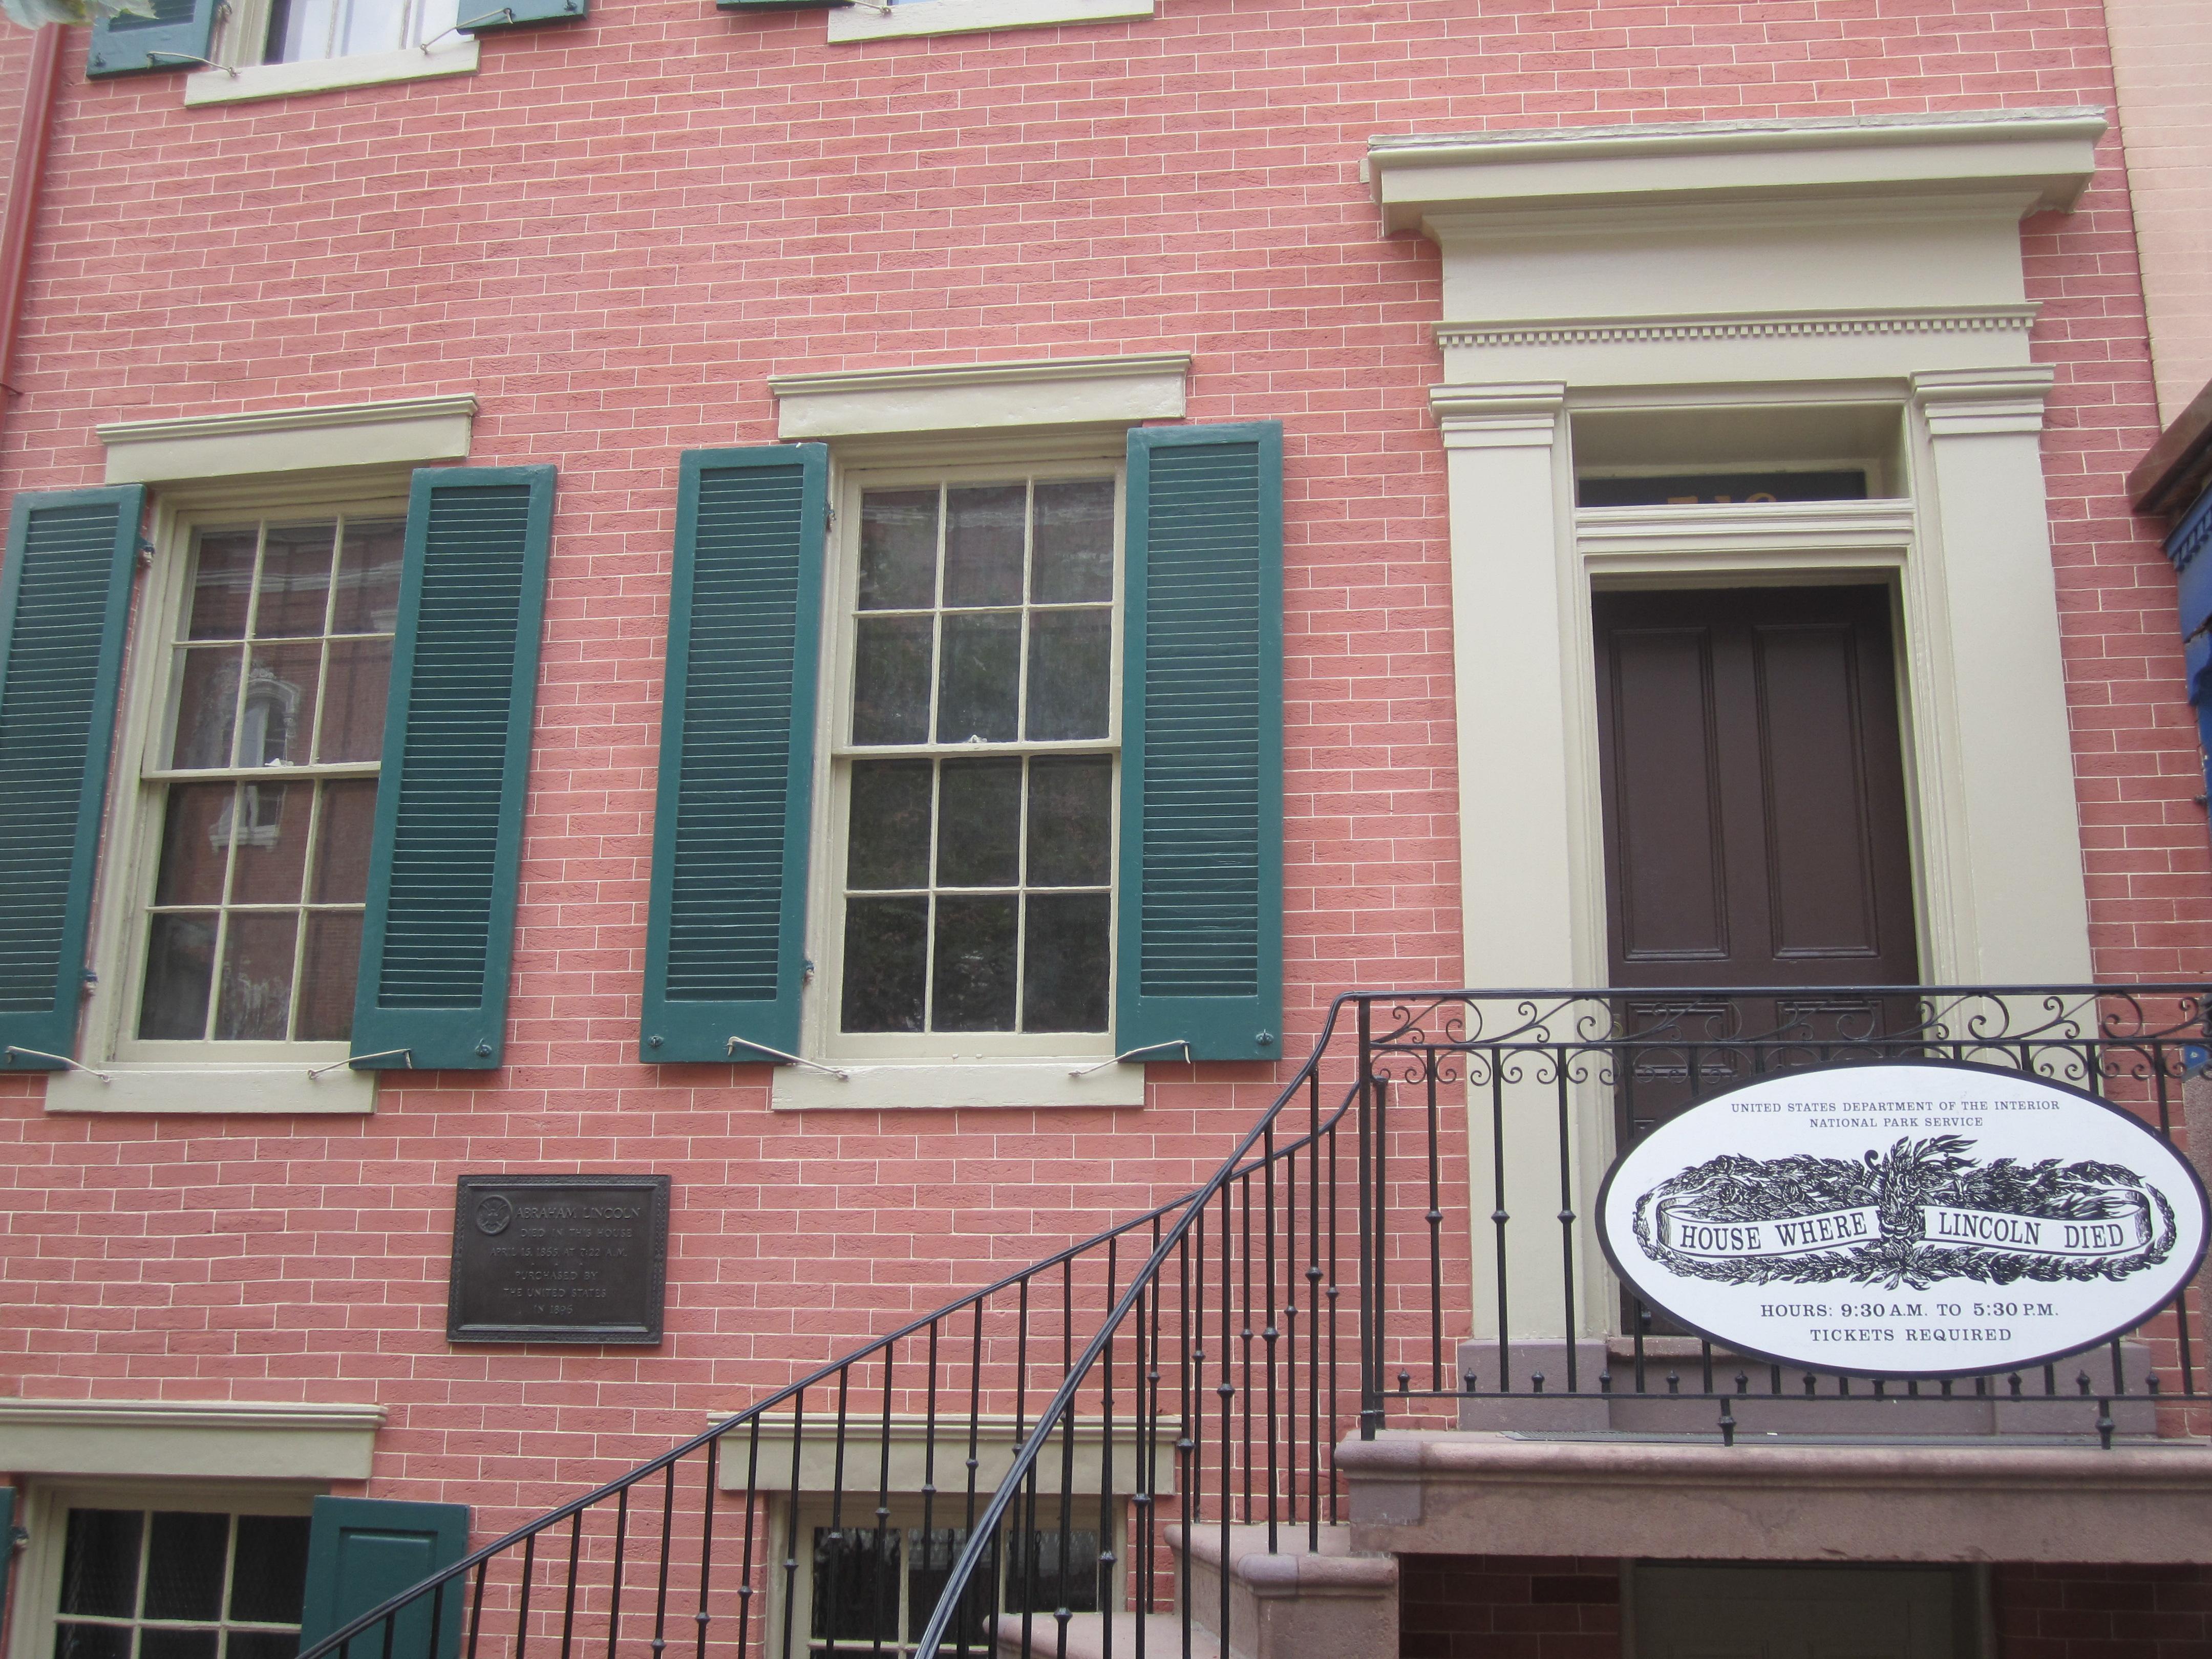 Petersen House in Washington, D.C. Photo taken on July 29, 2011.